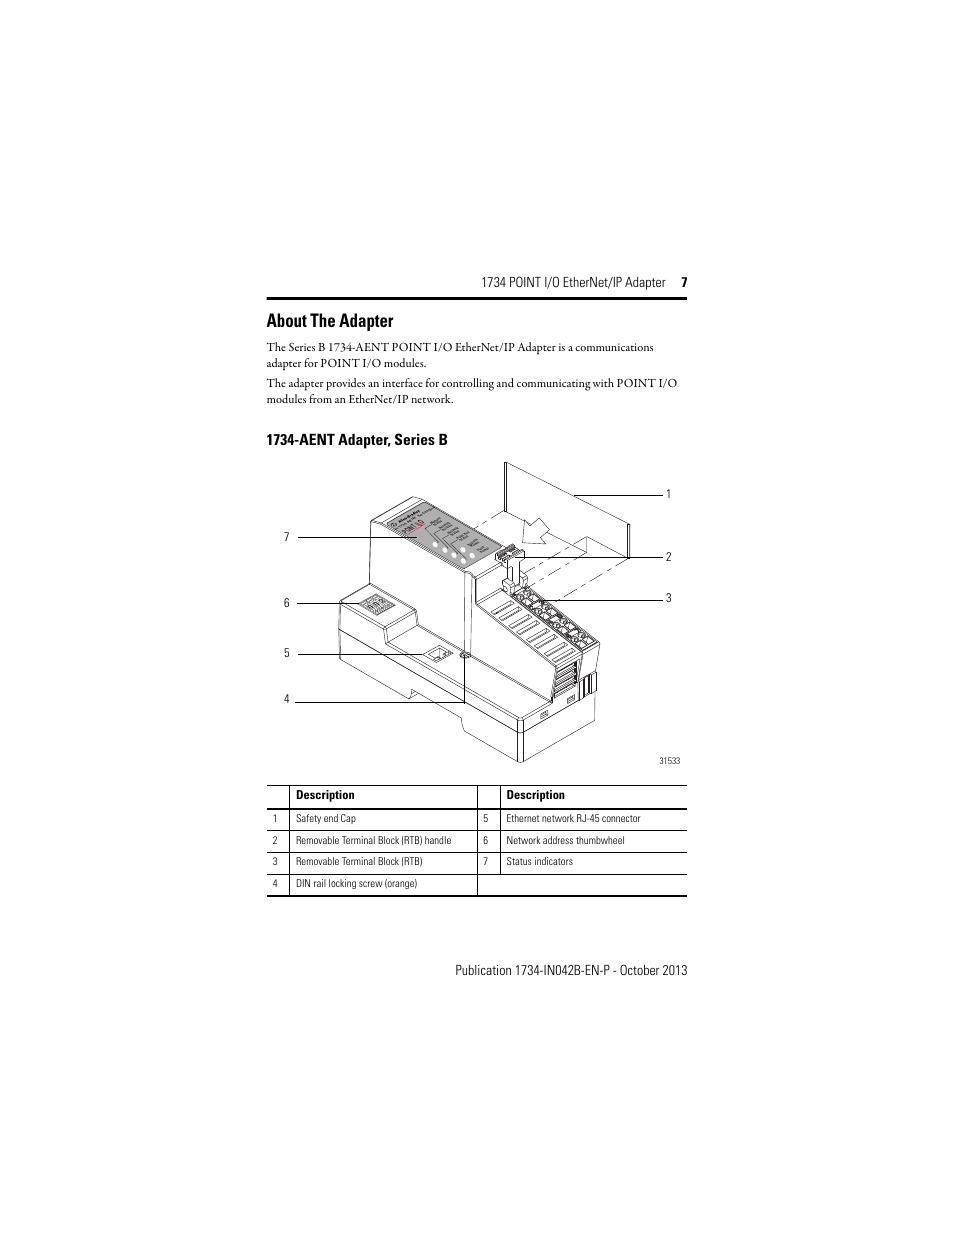 1734 aent series b manual